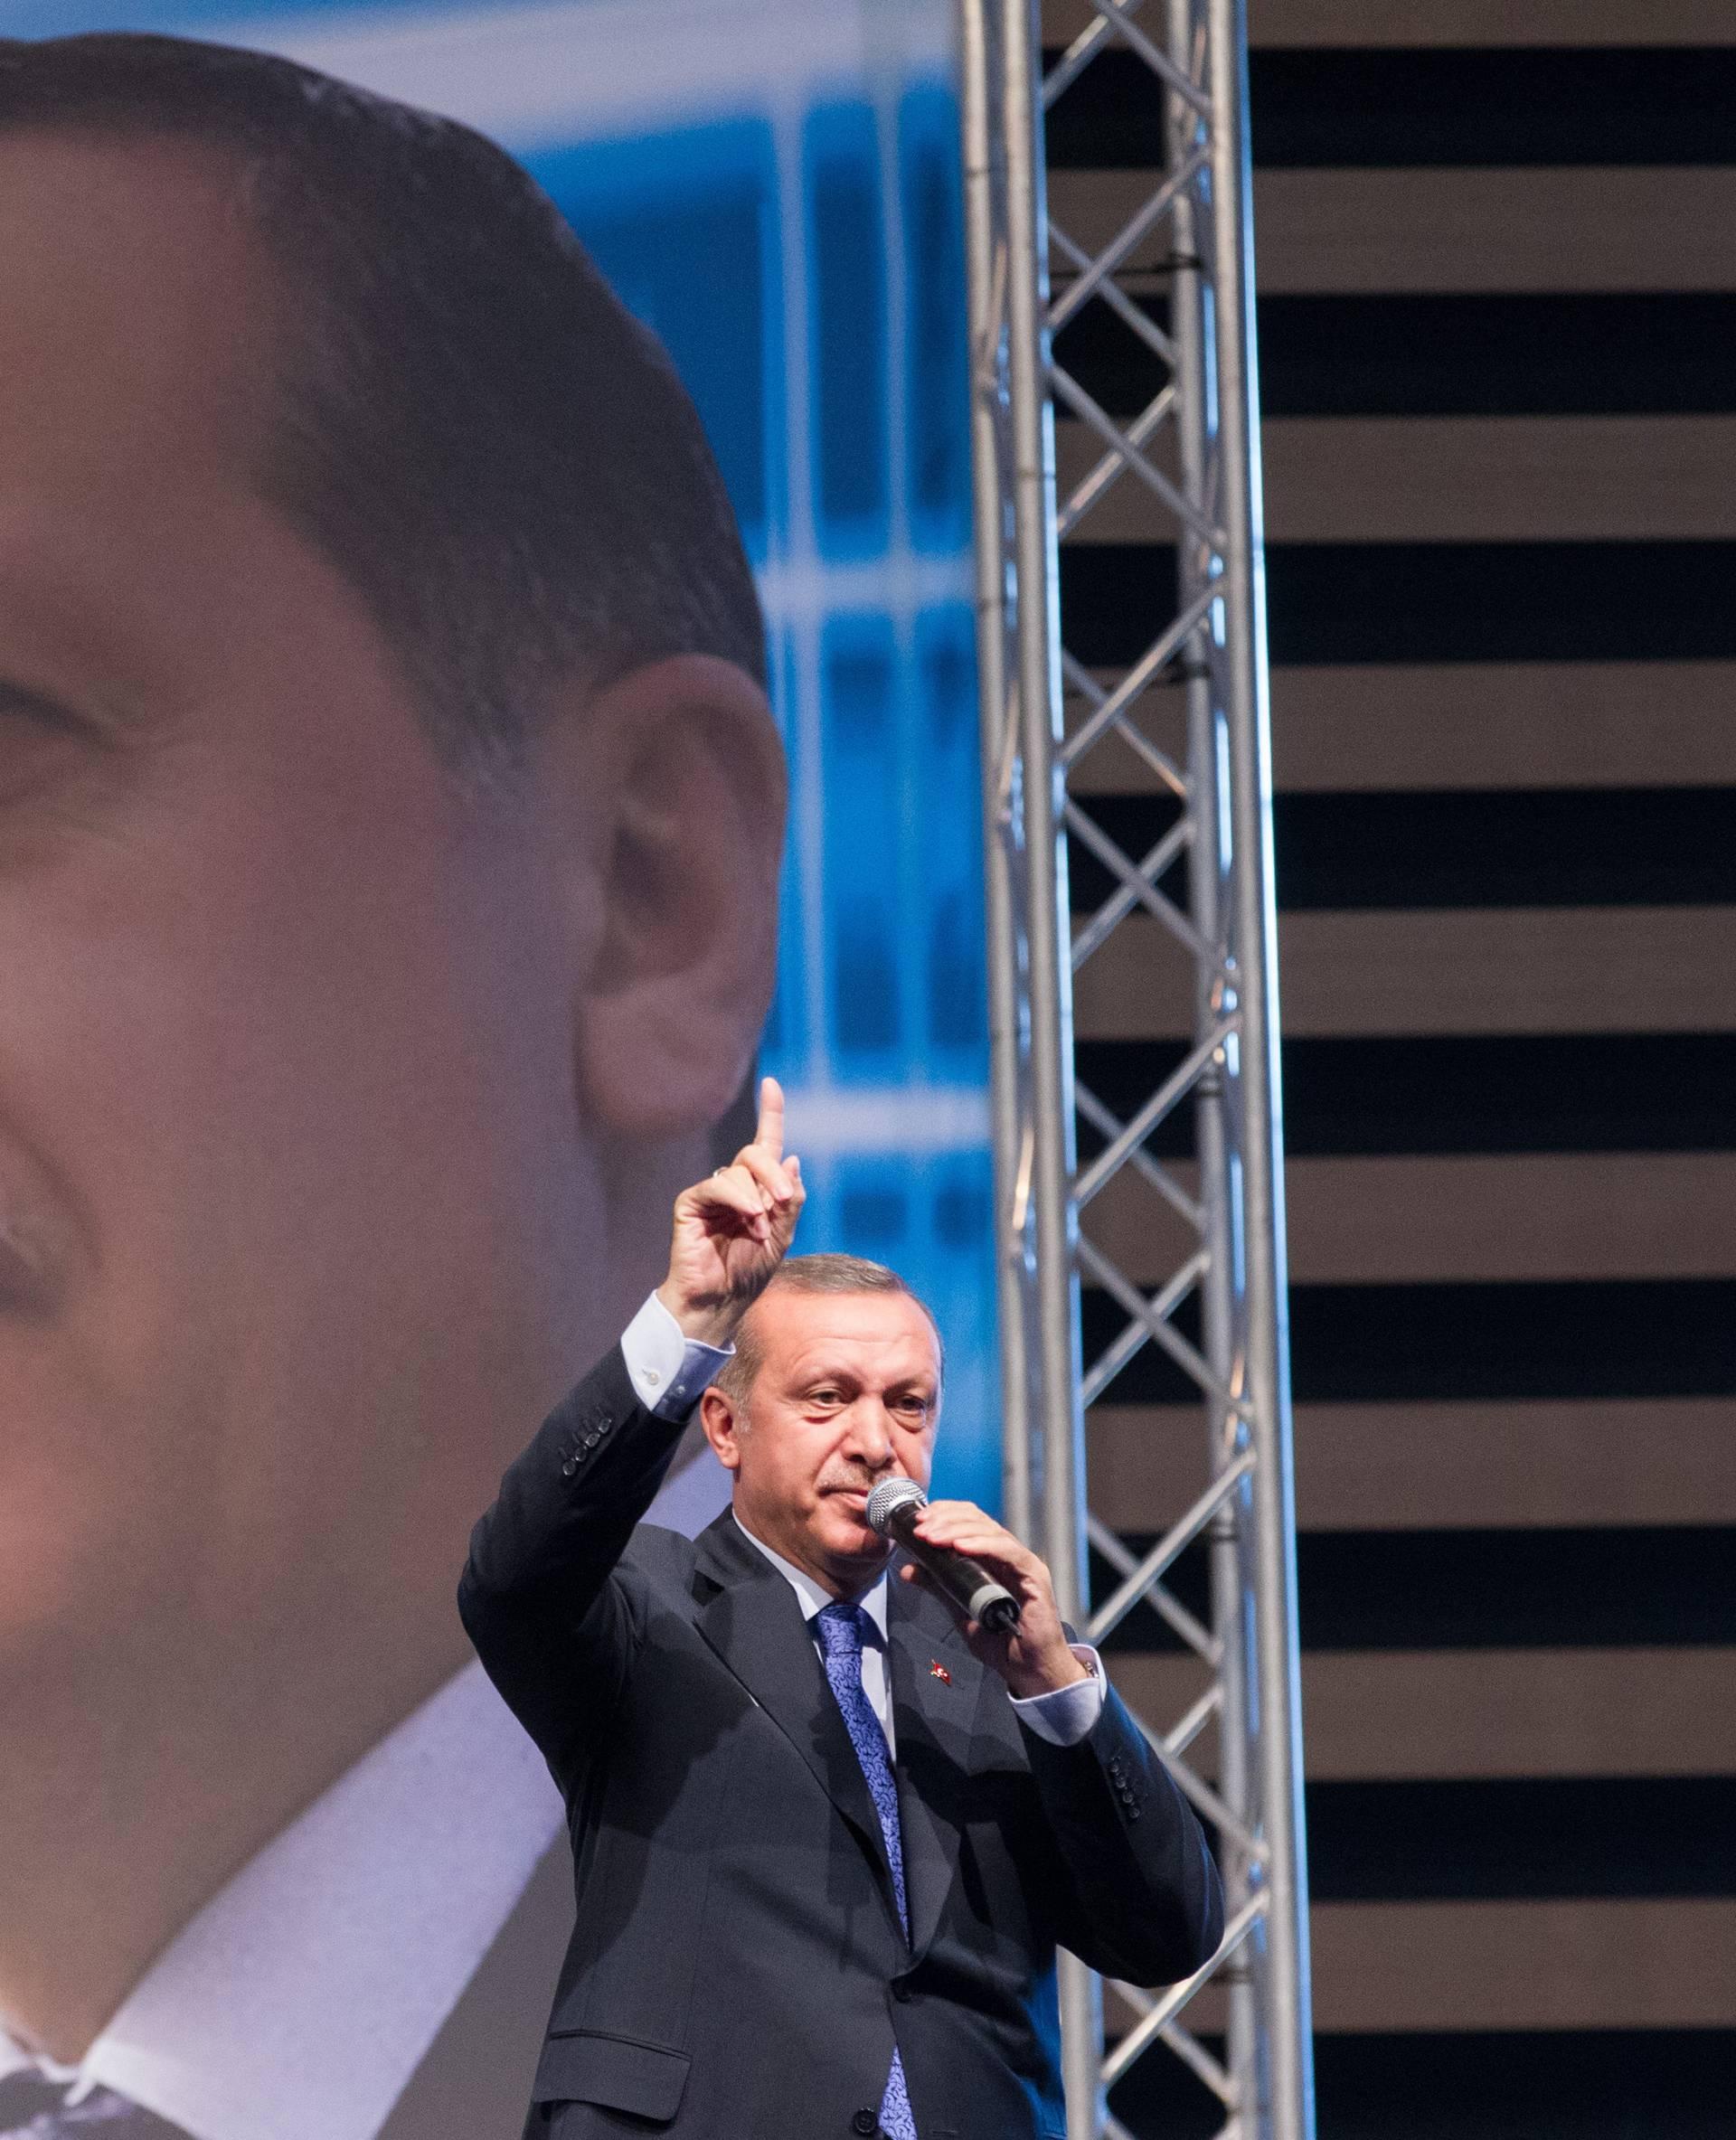 Turkey's PM Recep Tayyip Erdogan Holds A Meeting - Lyon